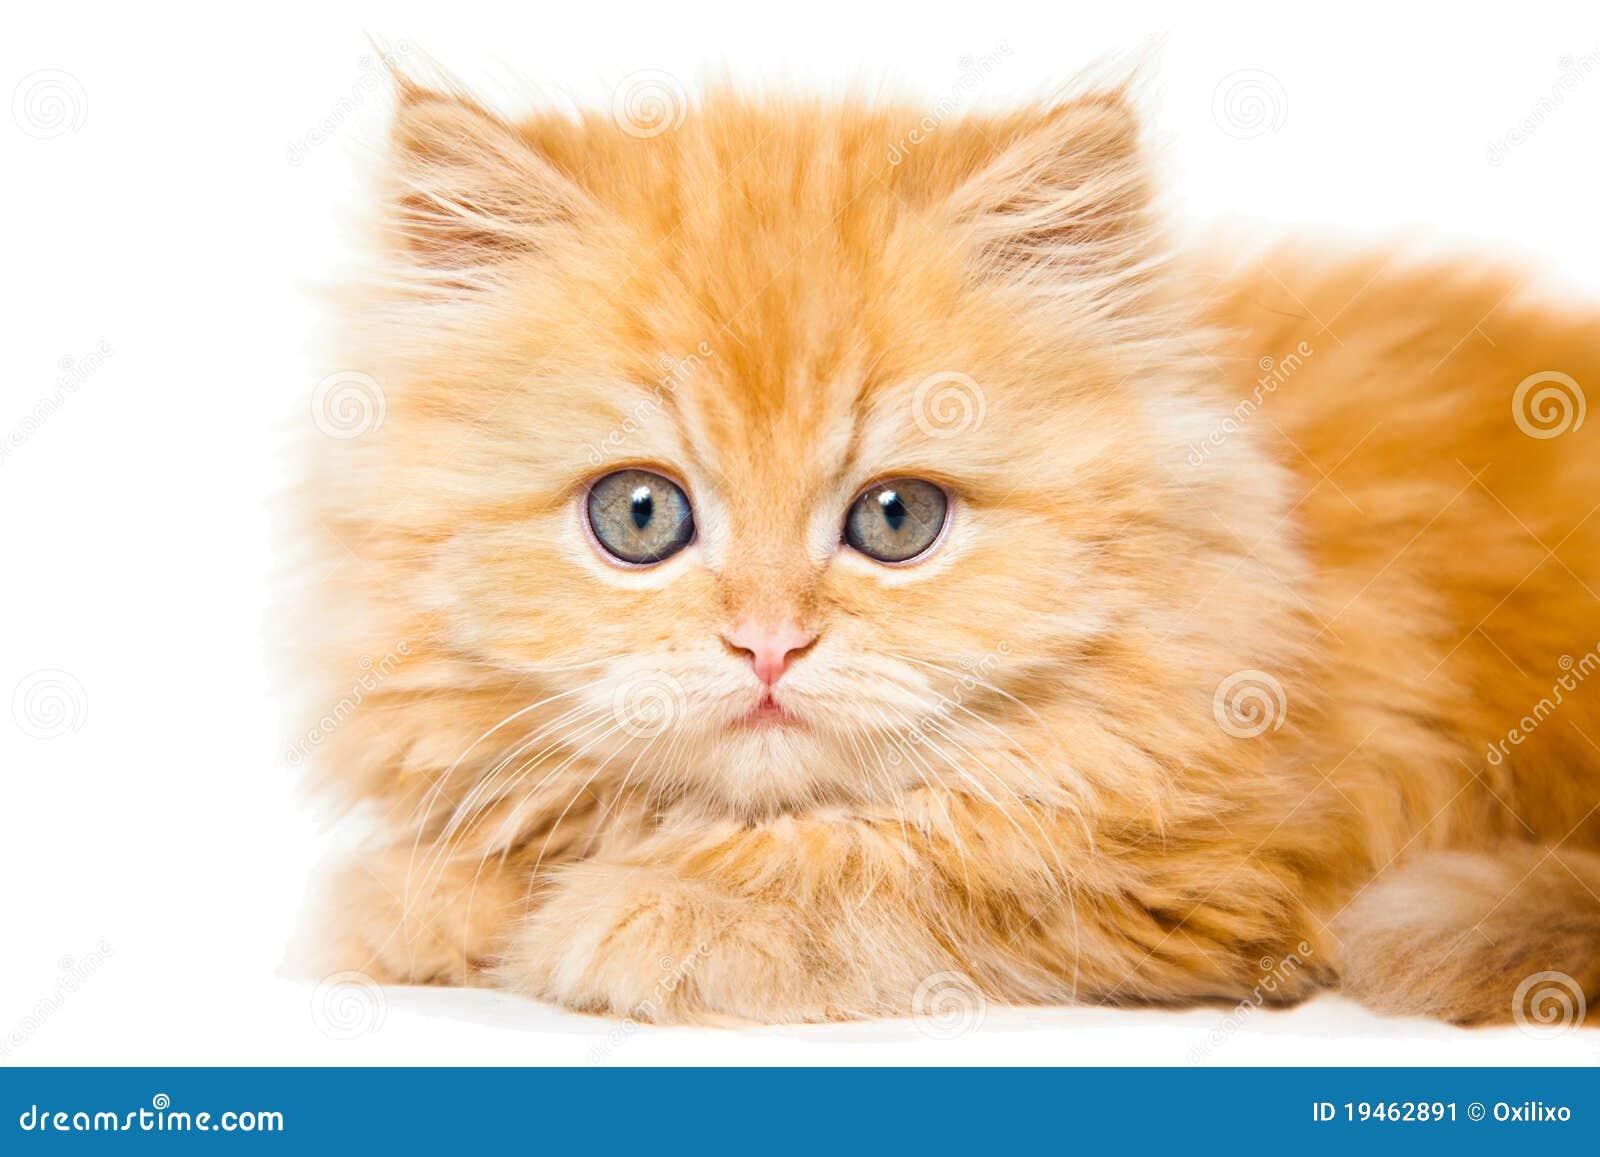 Orange And White Persian Kitten Small red persian kitten White Teacup Persian Kitten